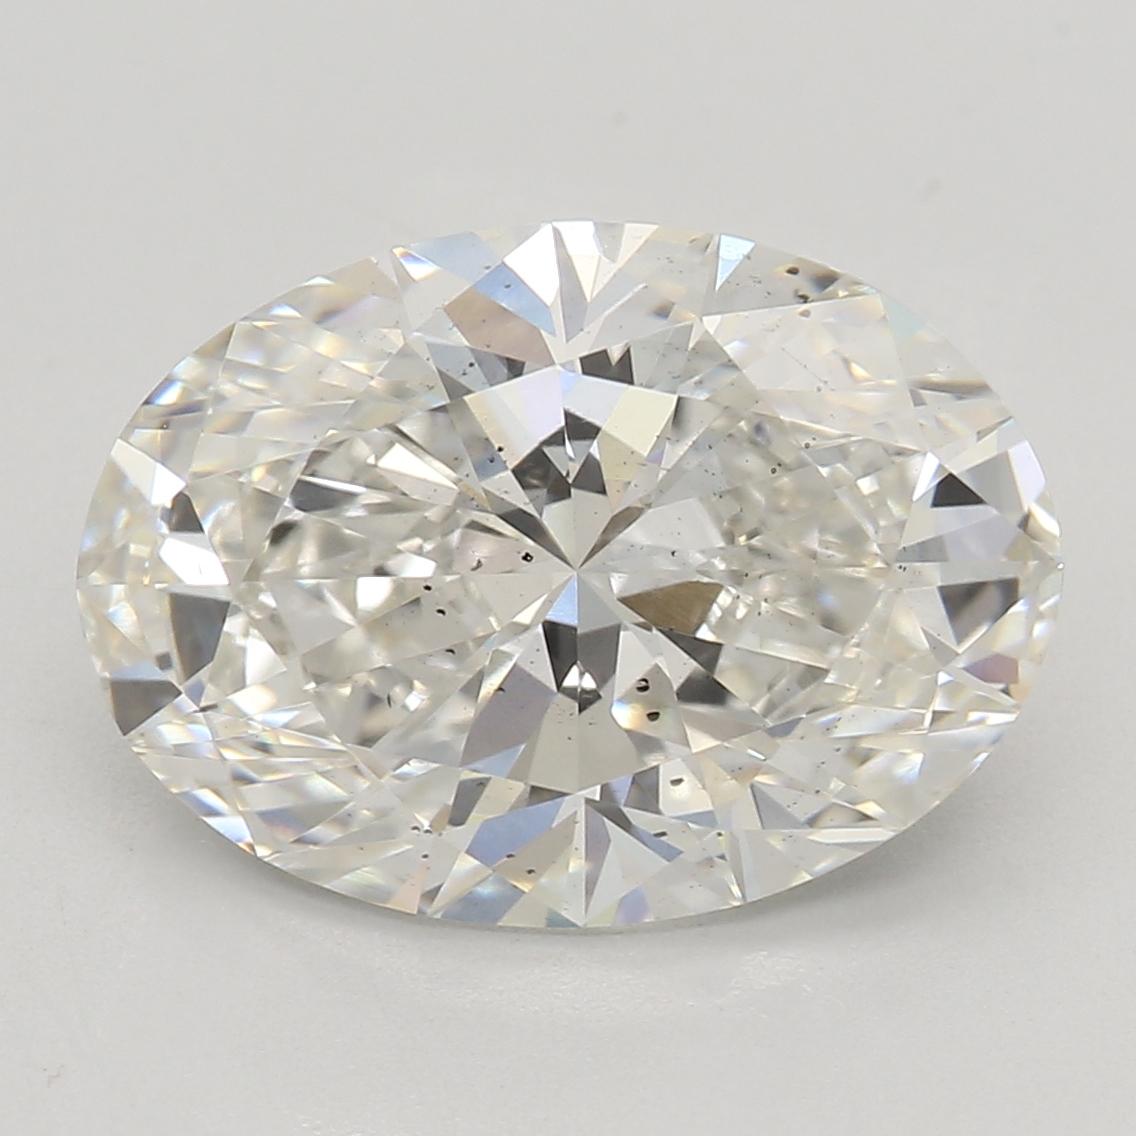 2.60 Carat I-SI1 Ideal Oval Diamond